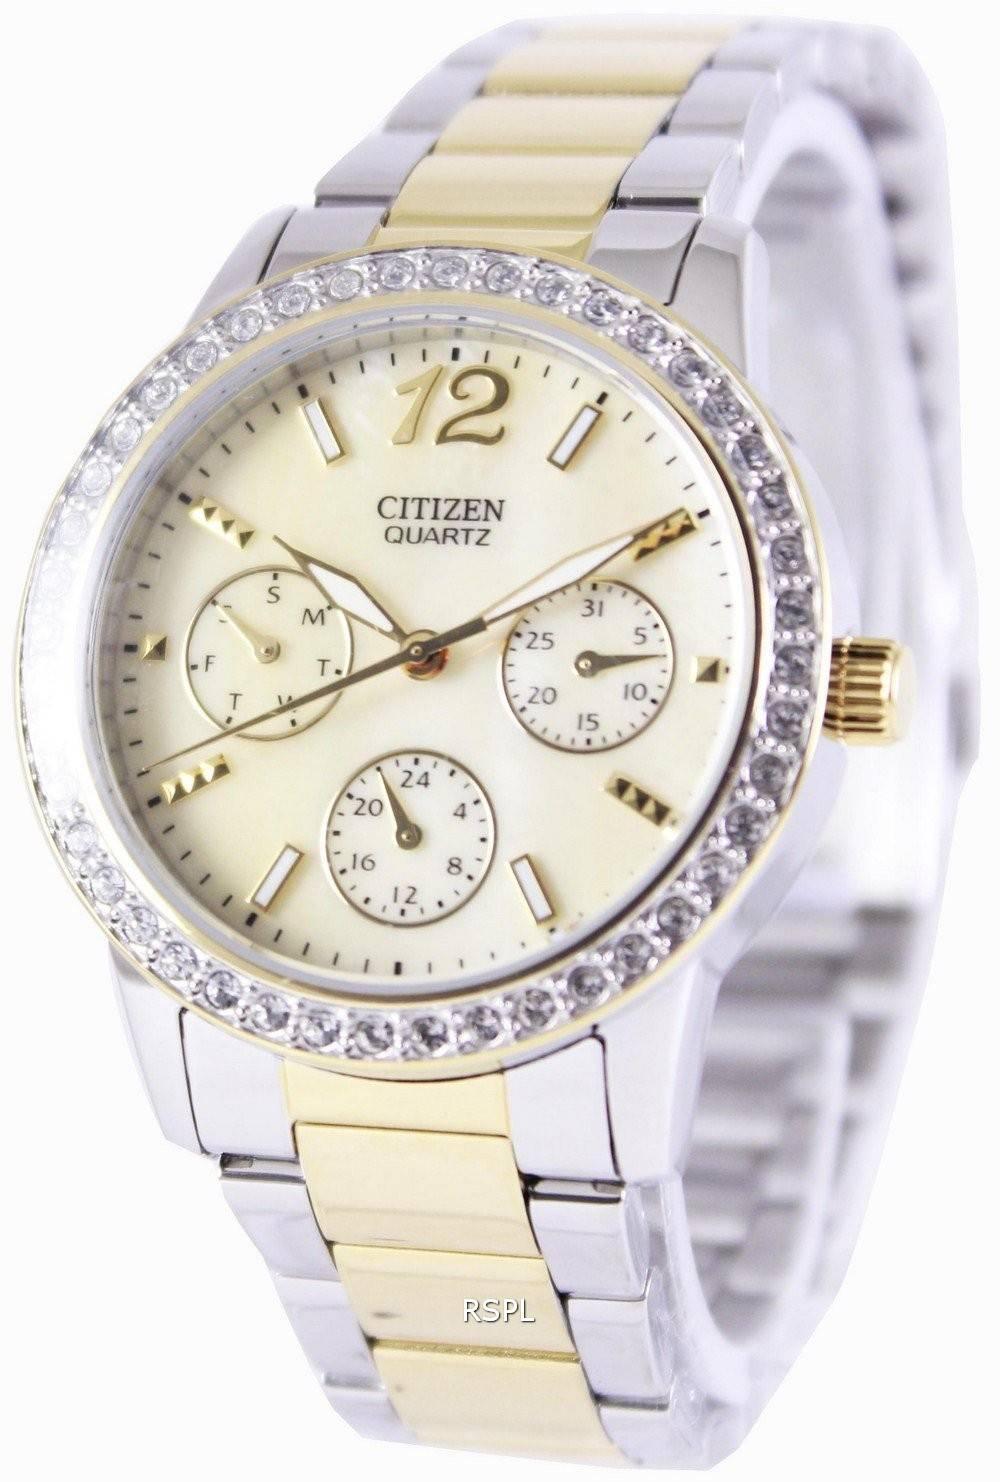 Citizen quartz swarovski crystals ed8094 52n womens watch for Swarovski crystals watch